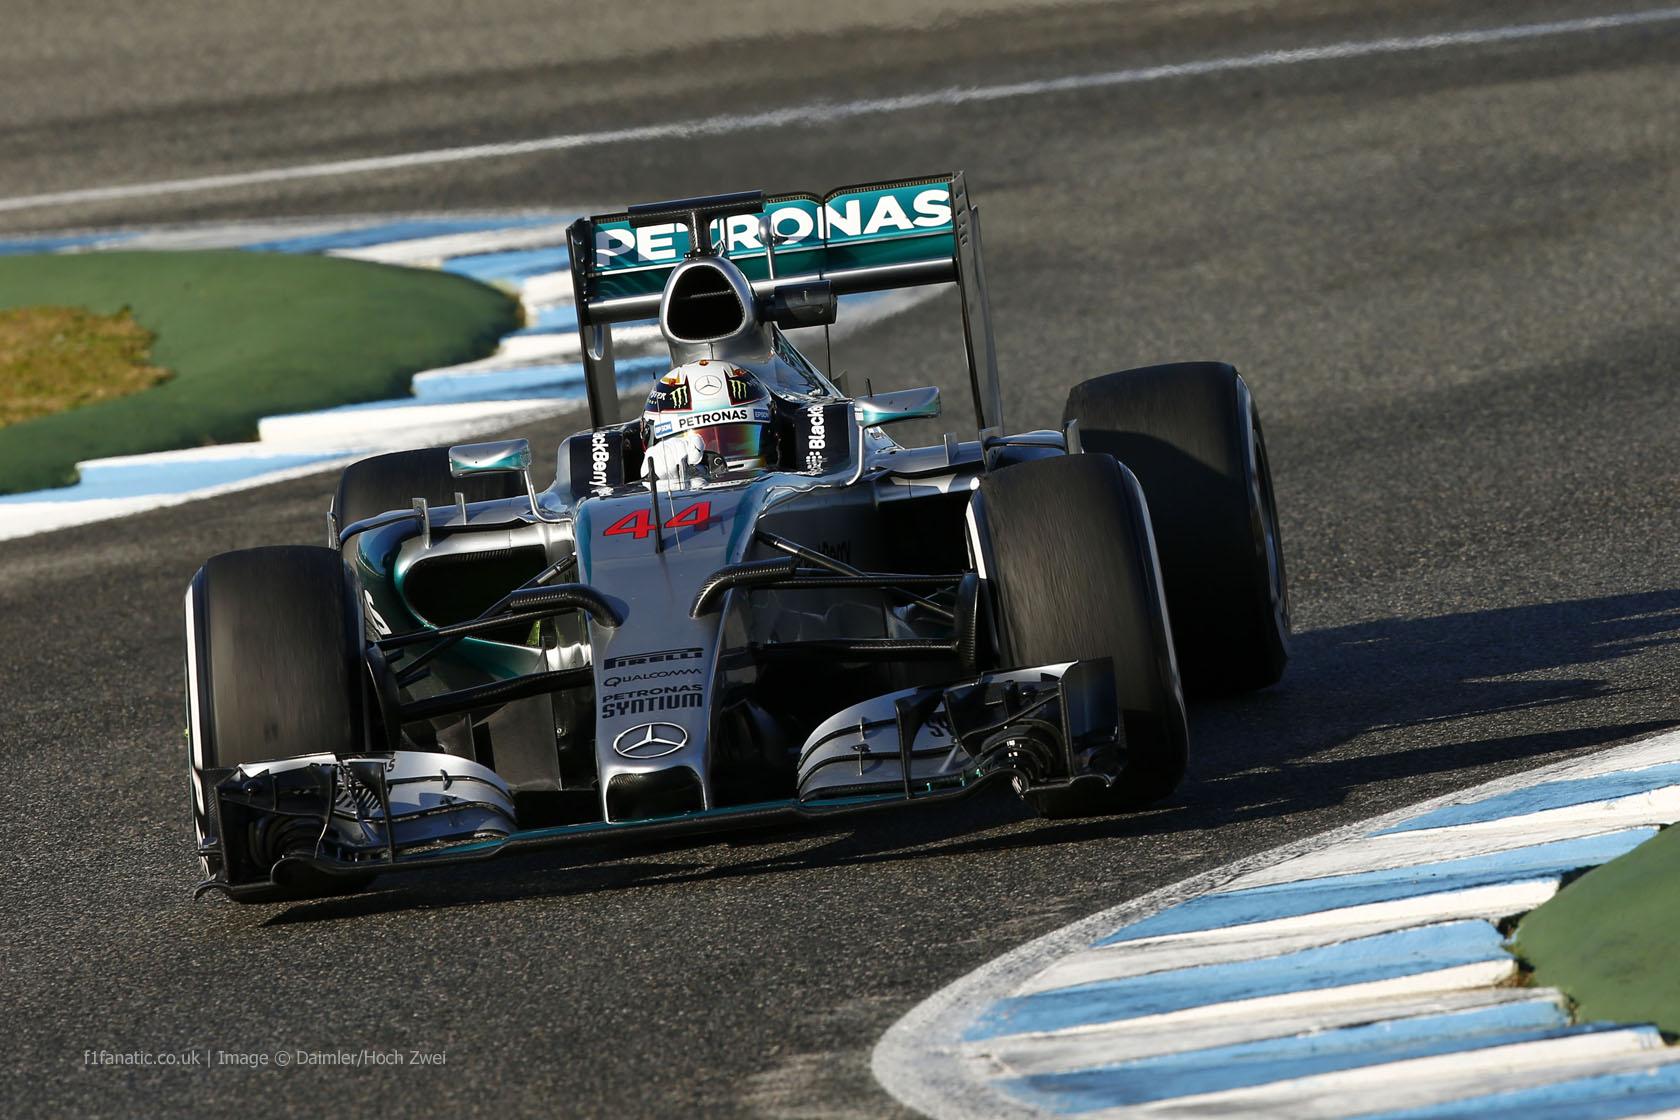 Lewis Hamilton, Mercedes, Circuito de Jerez, 2015